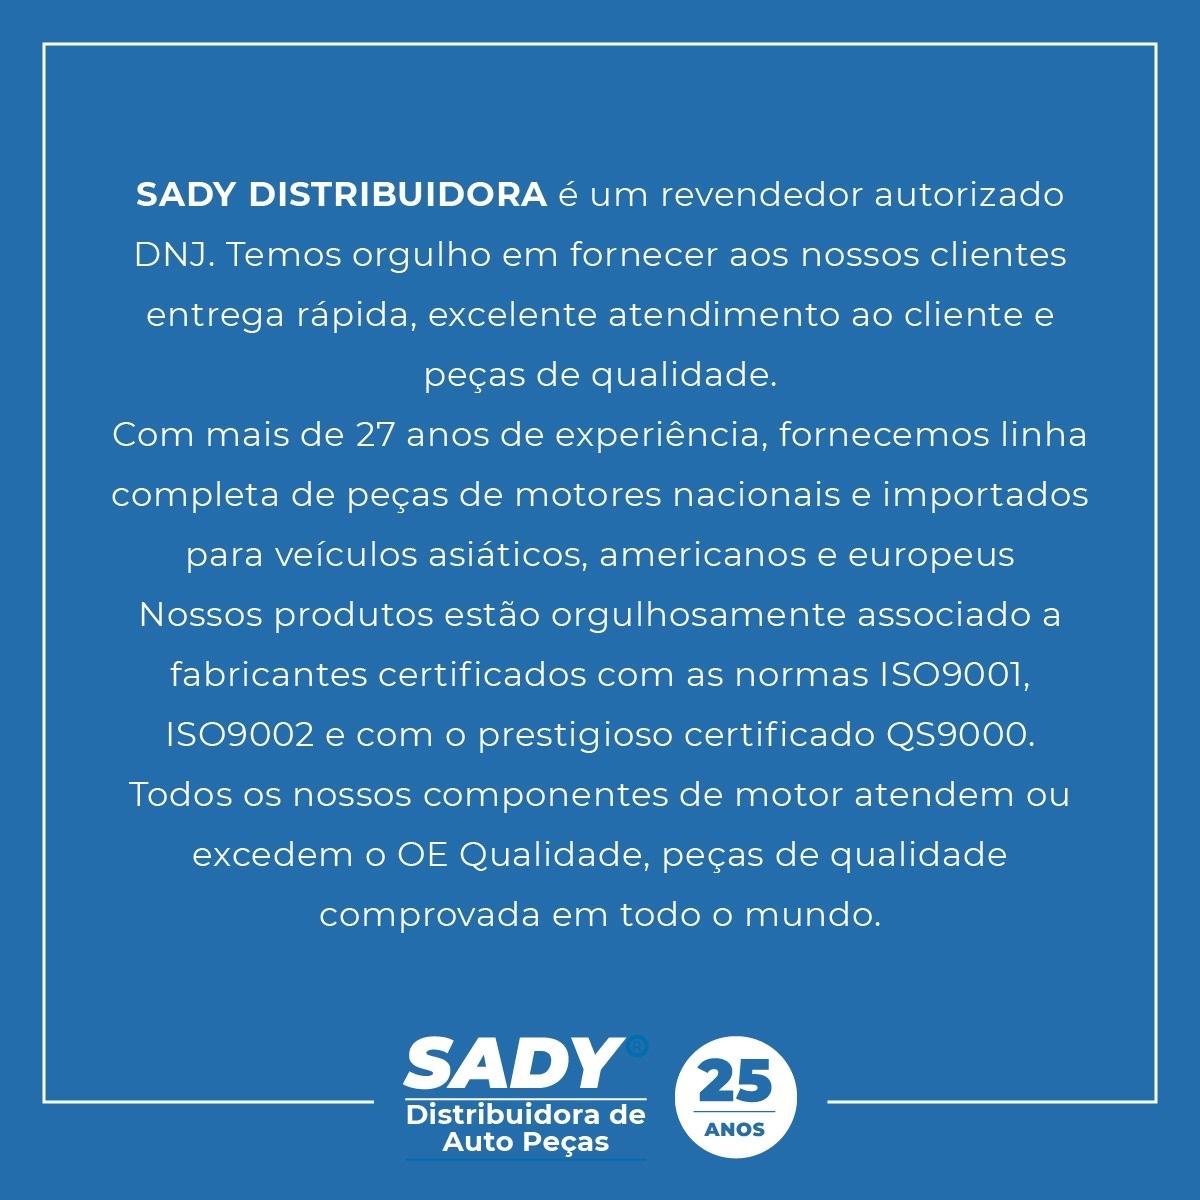 BOMBA DE OLEO DO MOTOR KIA 2.5 24V